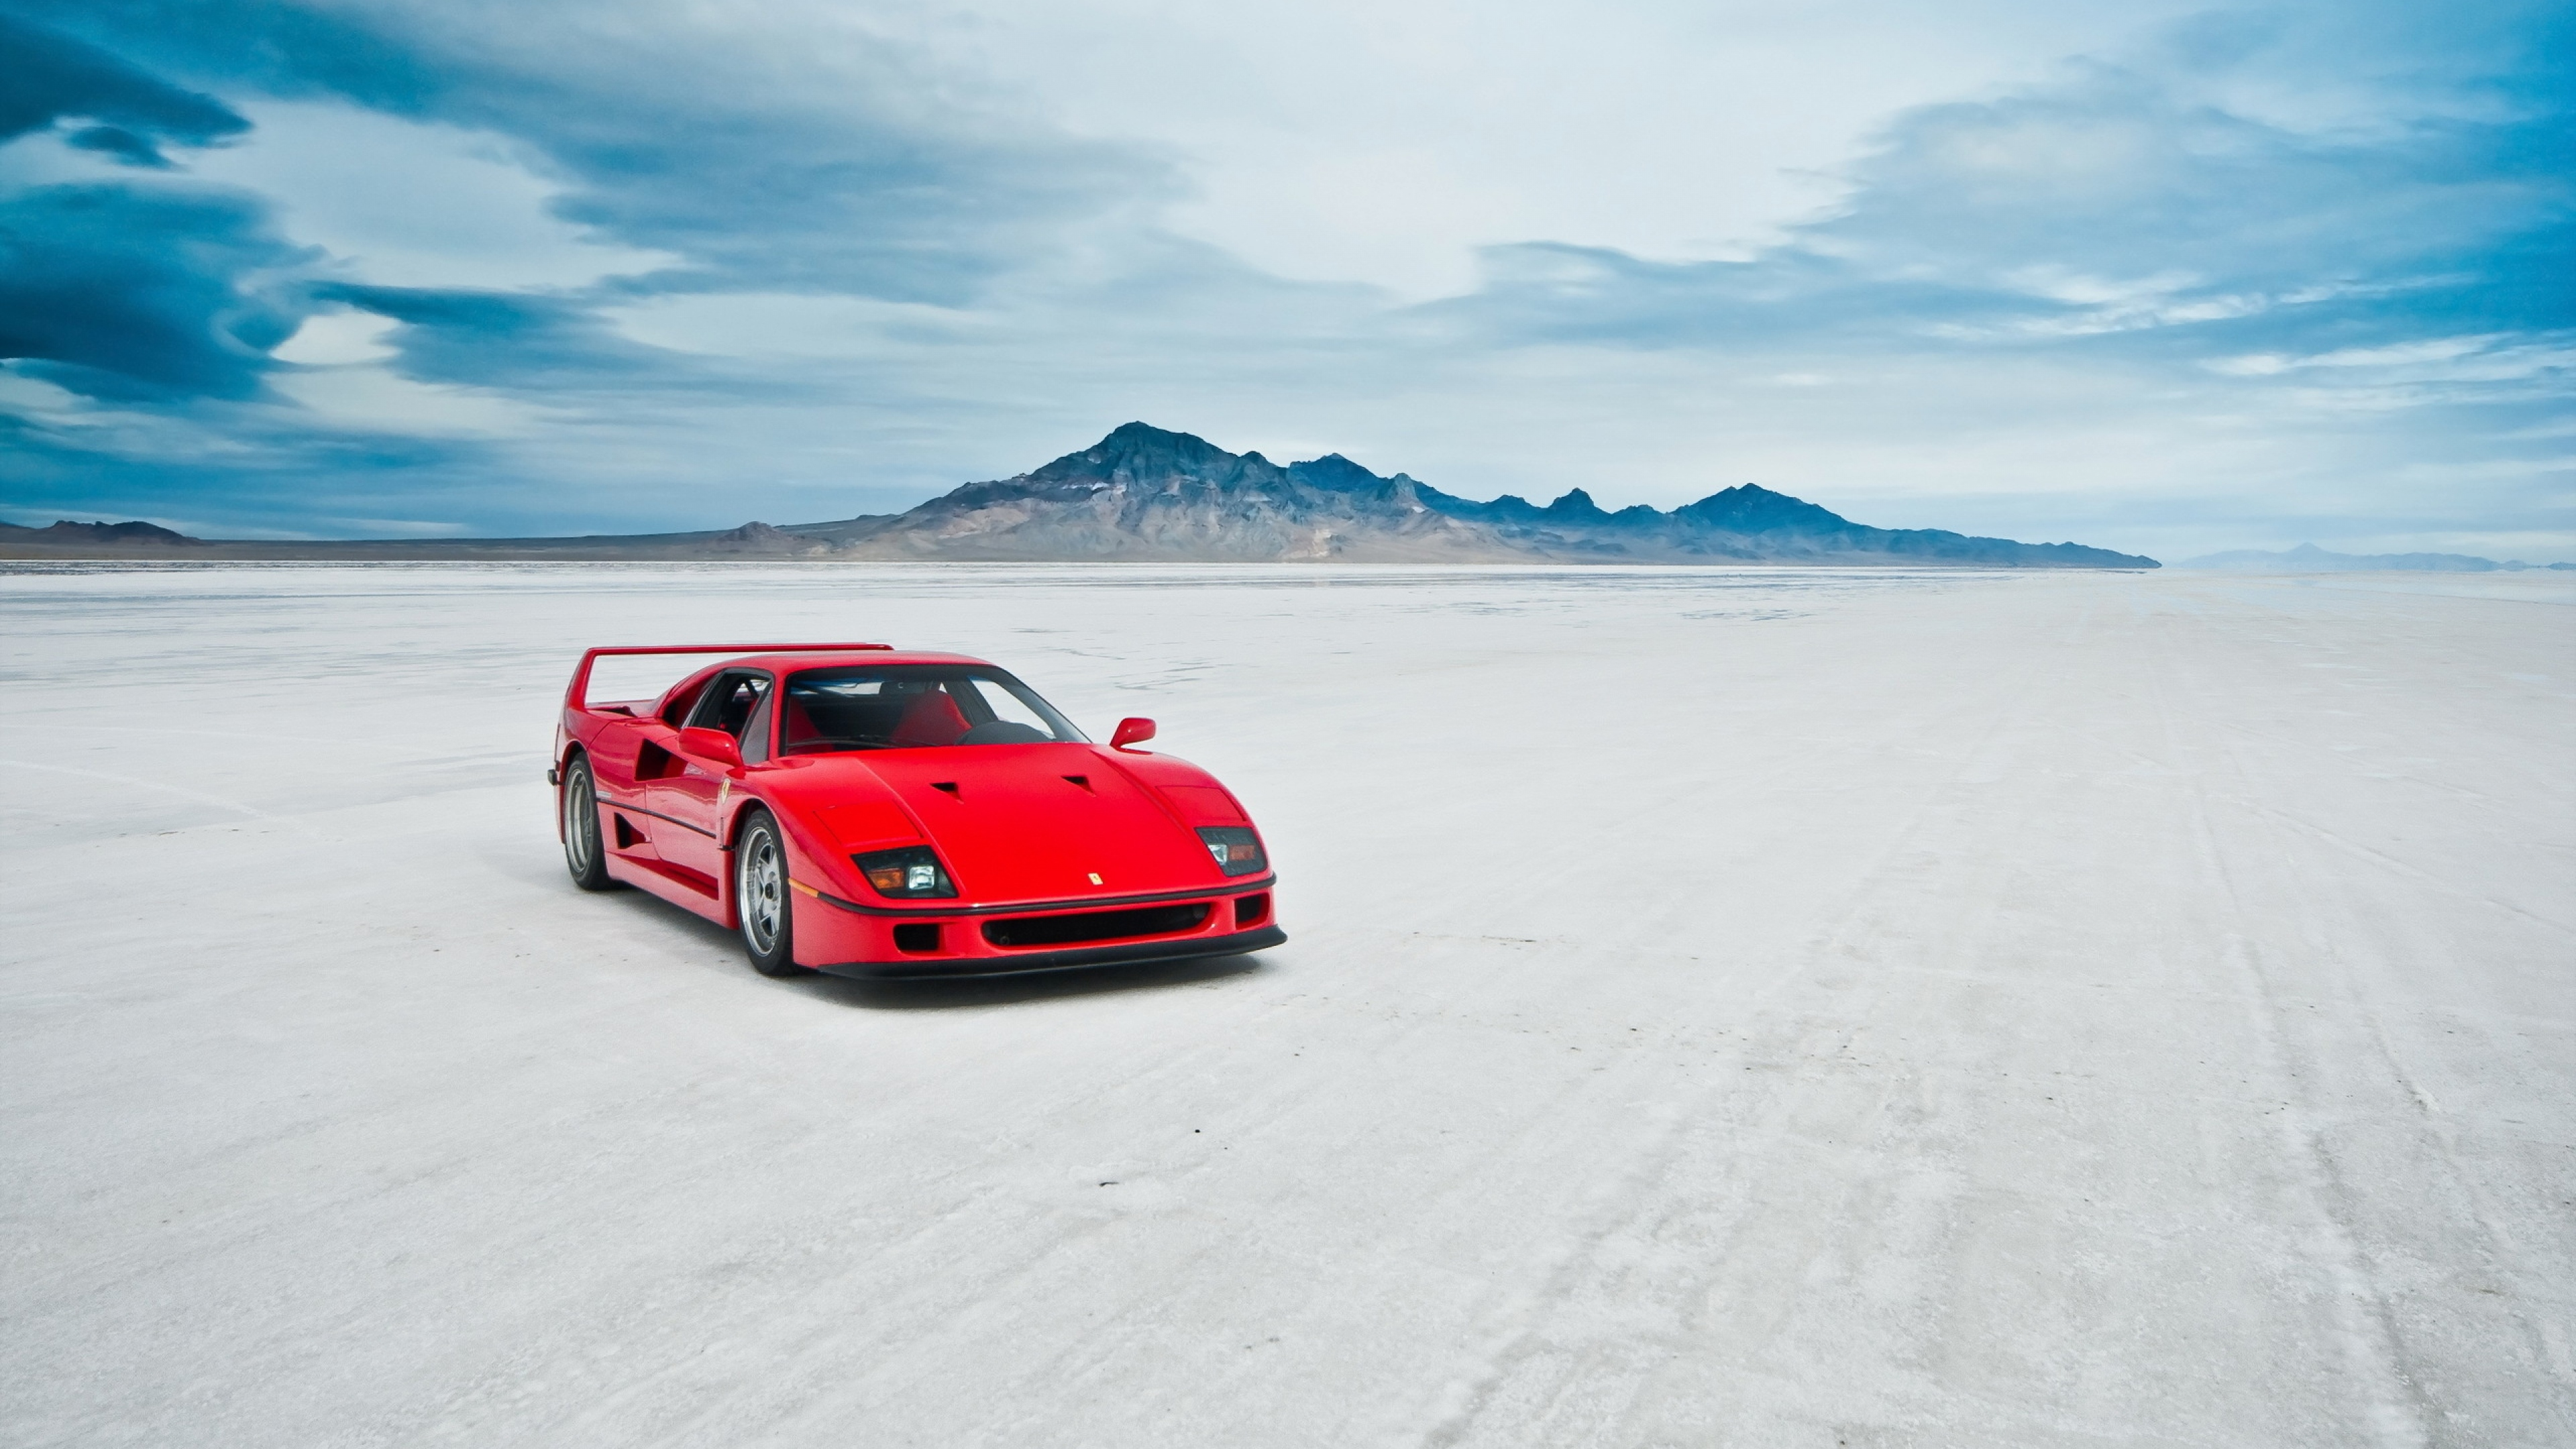 Background Pictures For Ferrari F40 Ferrari F40 Wallpaper Iphone 2100944 Hd Wallpaper Backgrounds Download